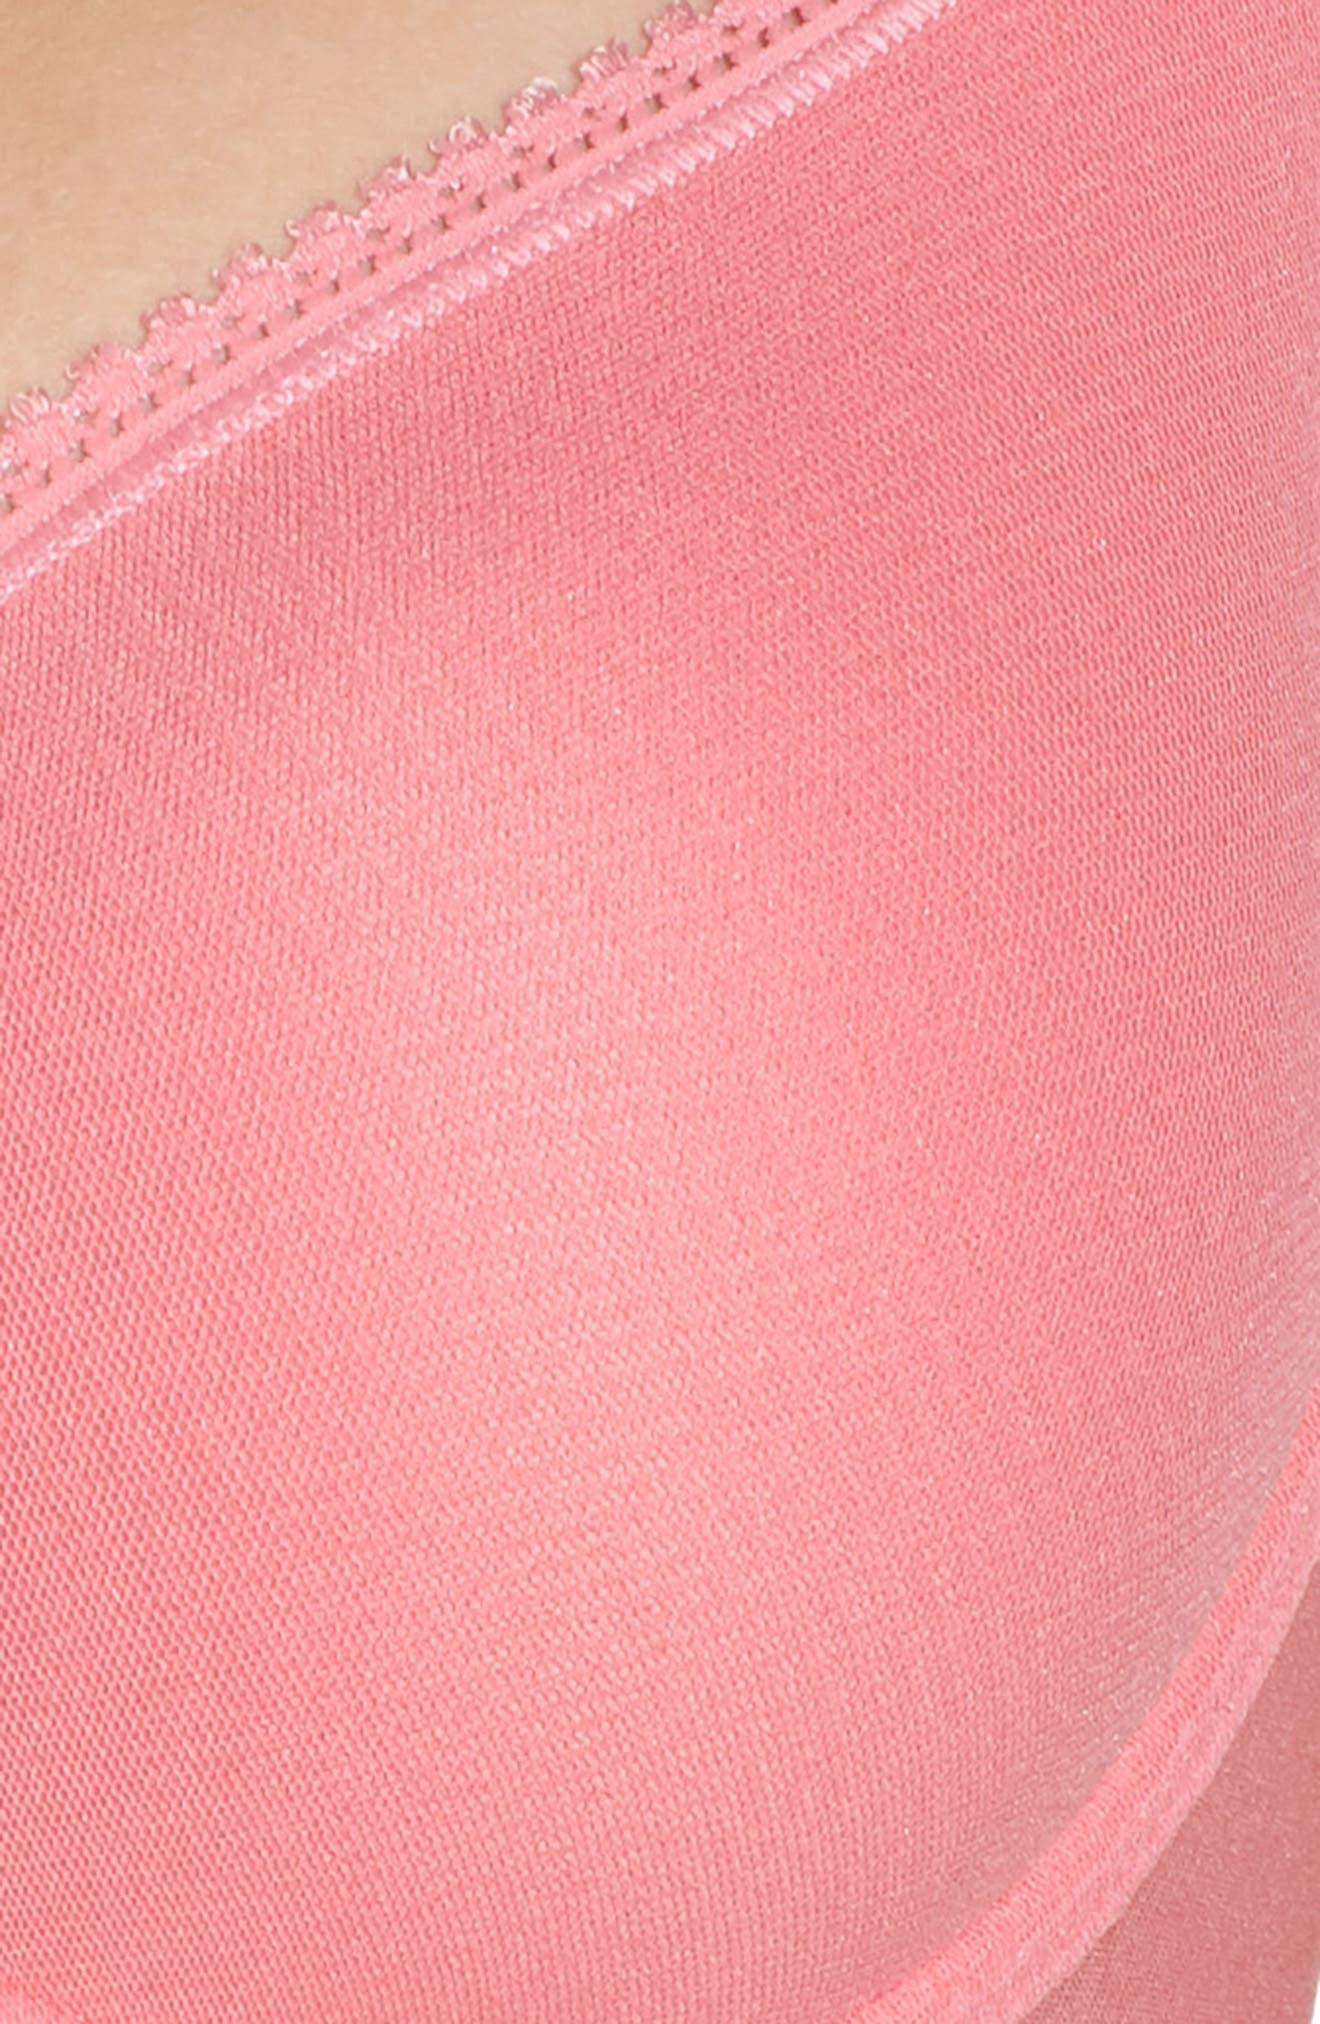 Underwire Convertible T-Shirt Bra,                             Alternate thumbnail 10, color,                             Rose Bloom